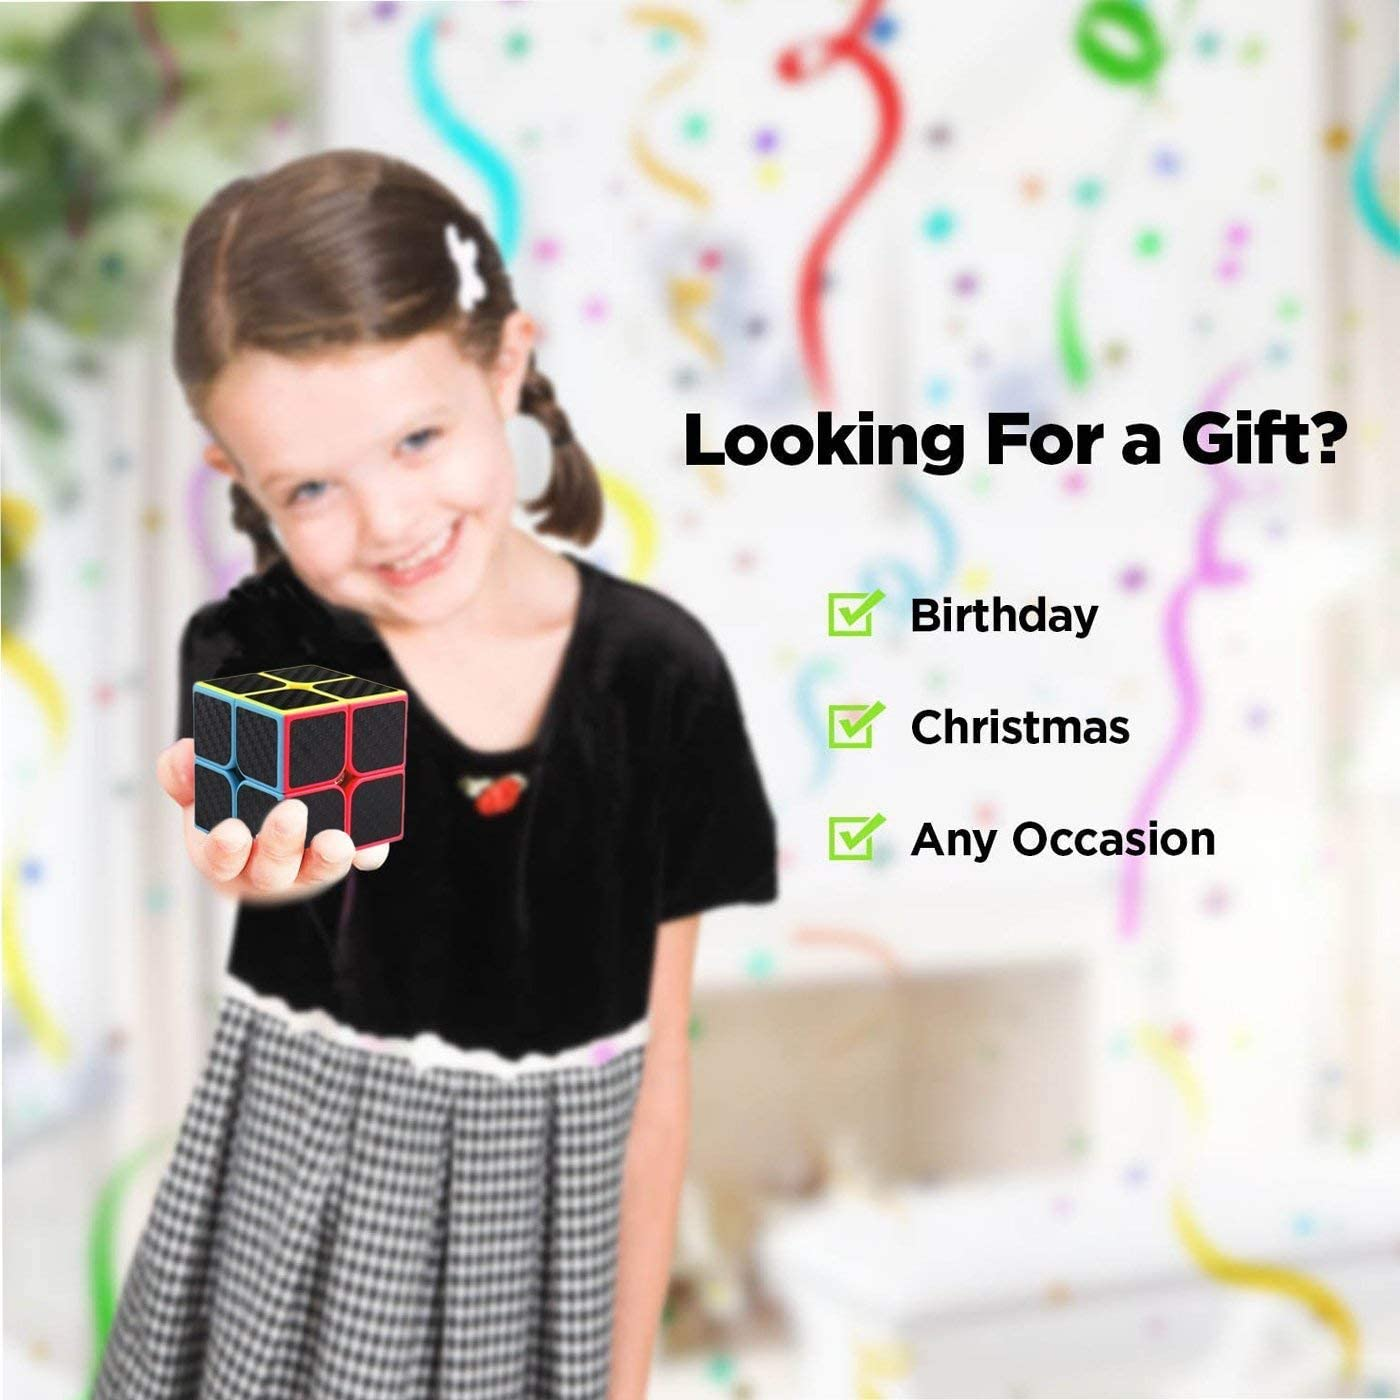 Jeu de Cubes de Vitesse Paquet de 5 2x2x2 3x3x3 Megaminx Skym Pyramid Cube en Fibre de Carbone Sticker Magic Cubes Collection Puzzle Box ROXENDA Speed Cubes,